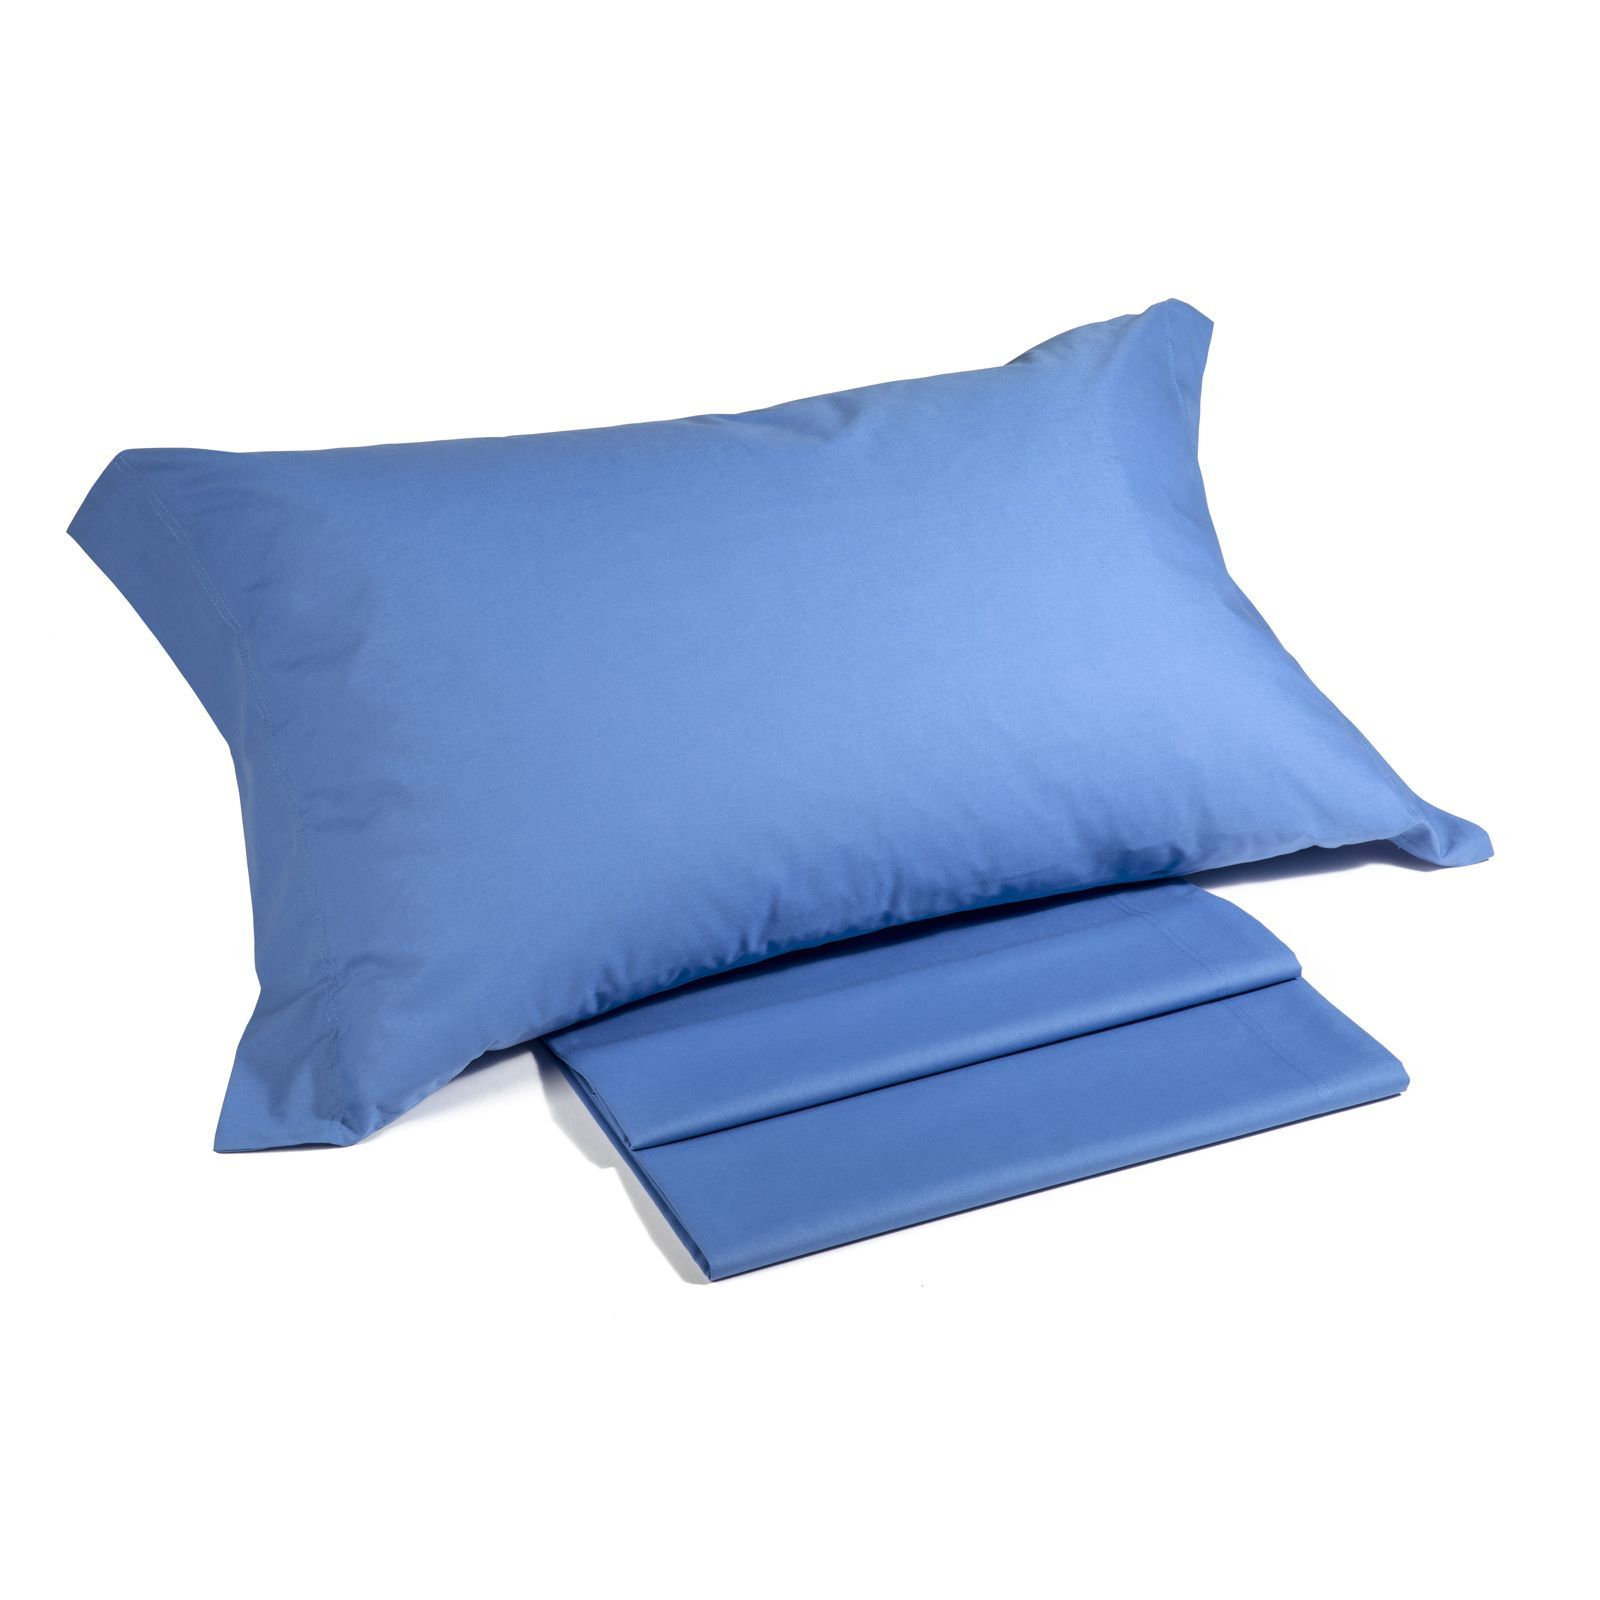 Наволочки для сна Наволочки 2шт 50х70 Caleffi Tinta Unita ярко-голубые navolochki-unita-ot-caleffi.jpg